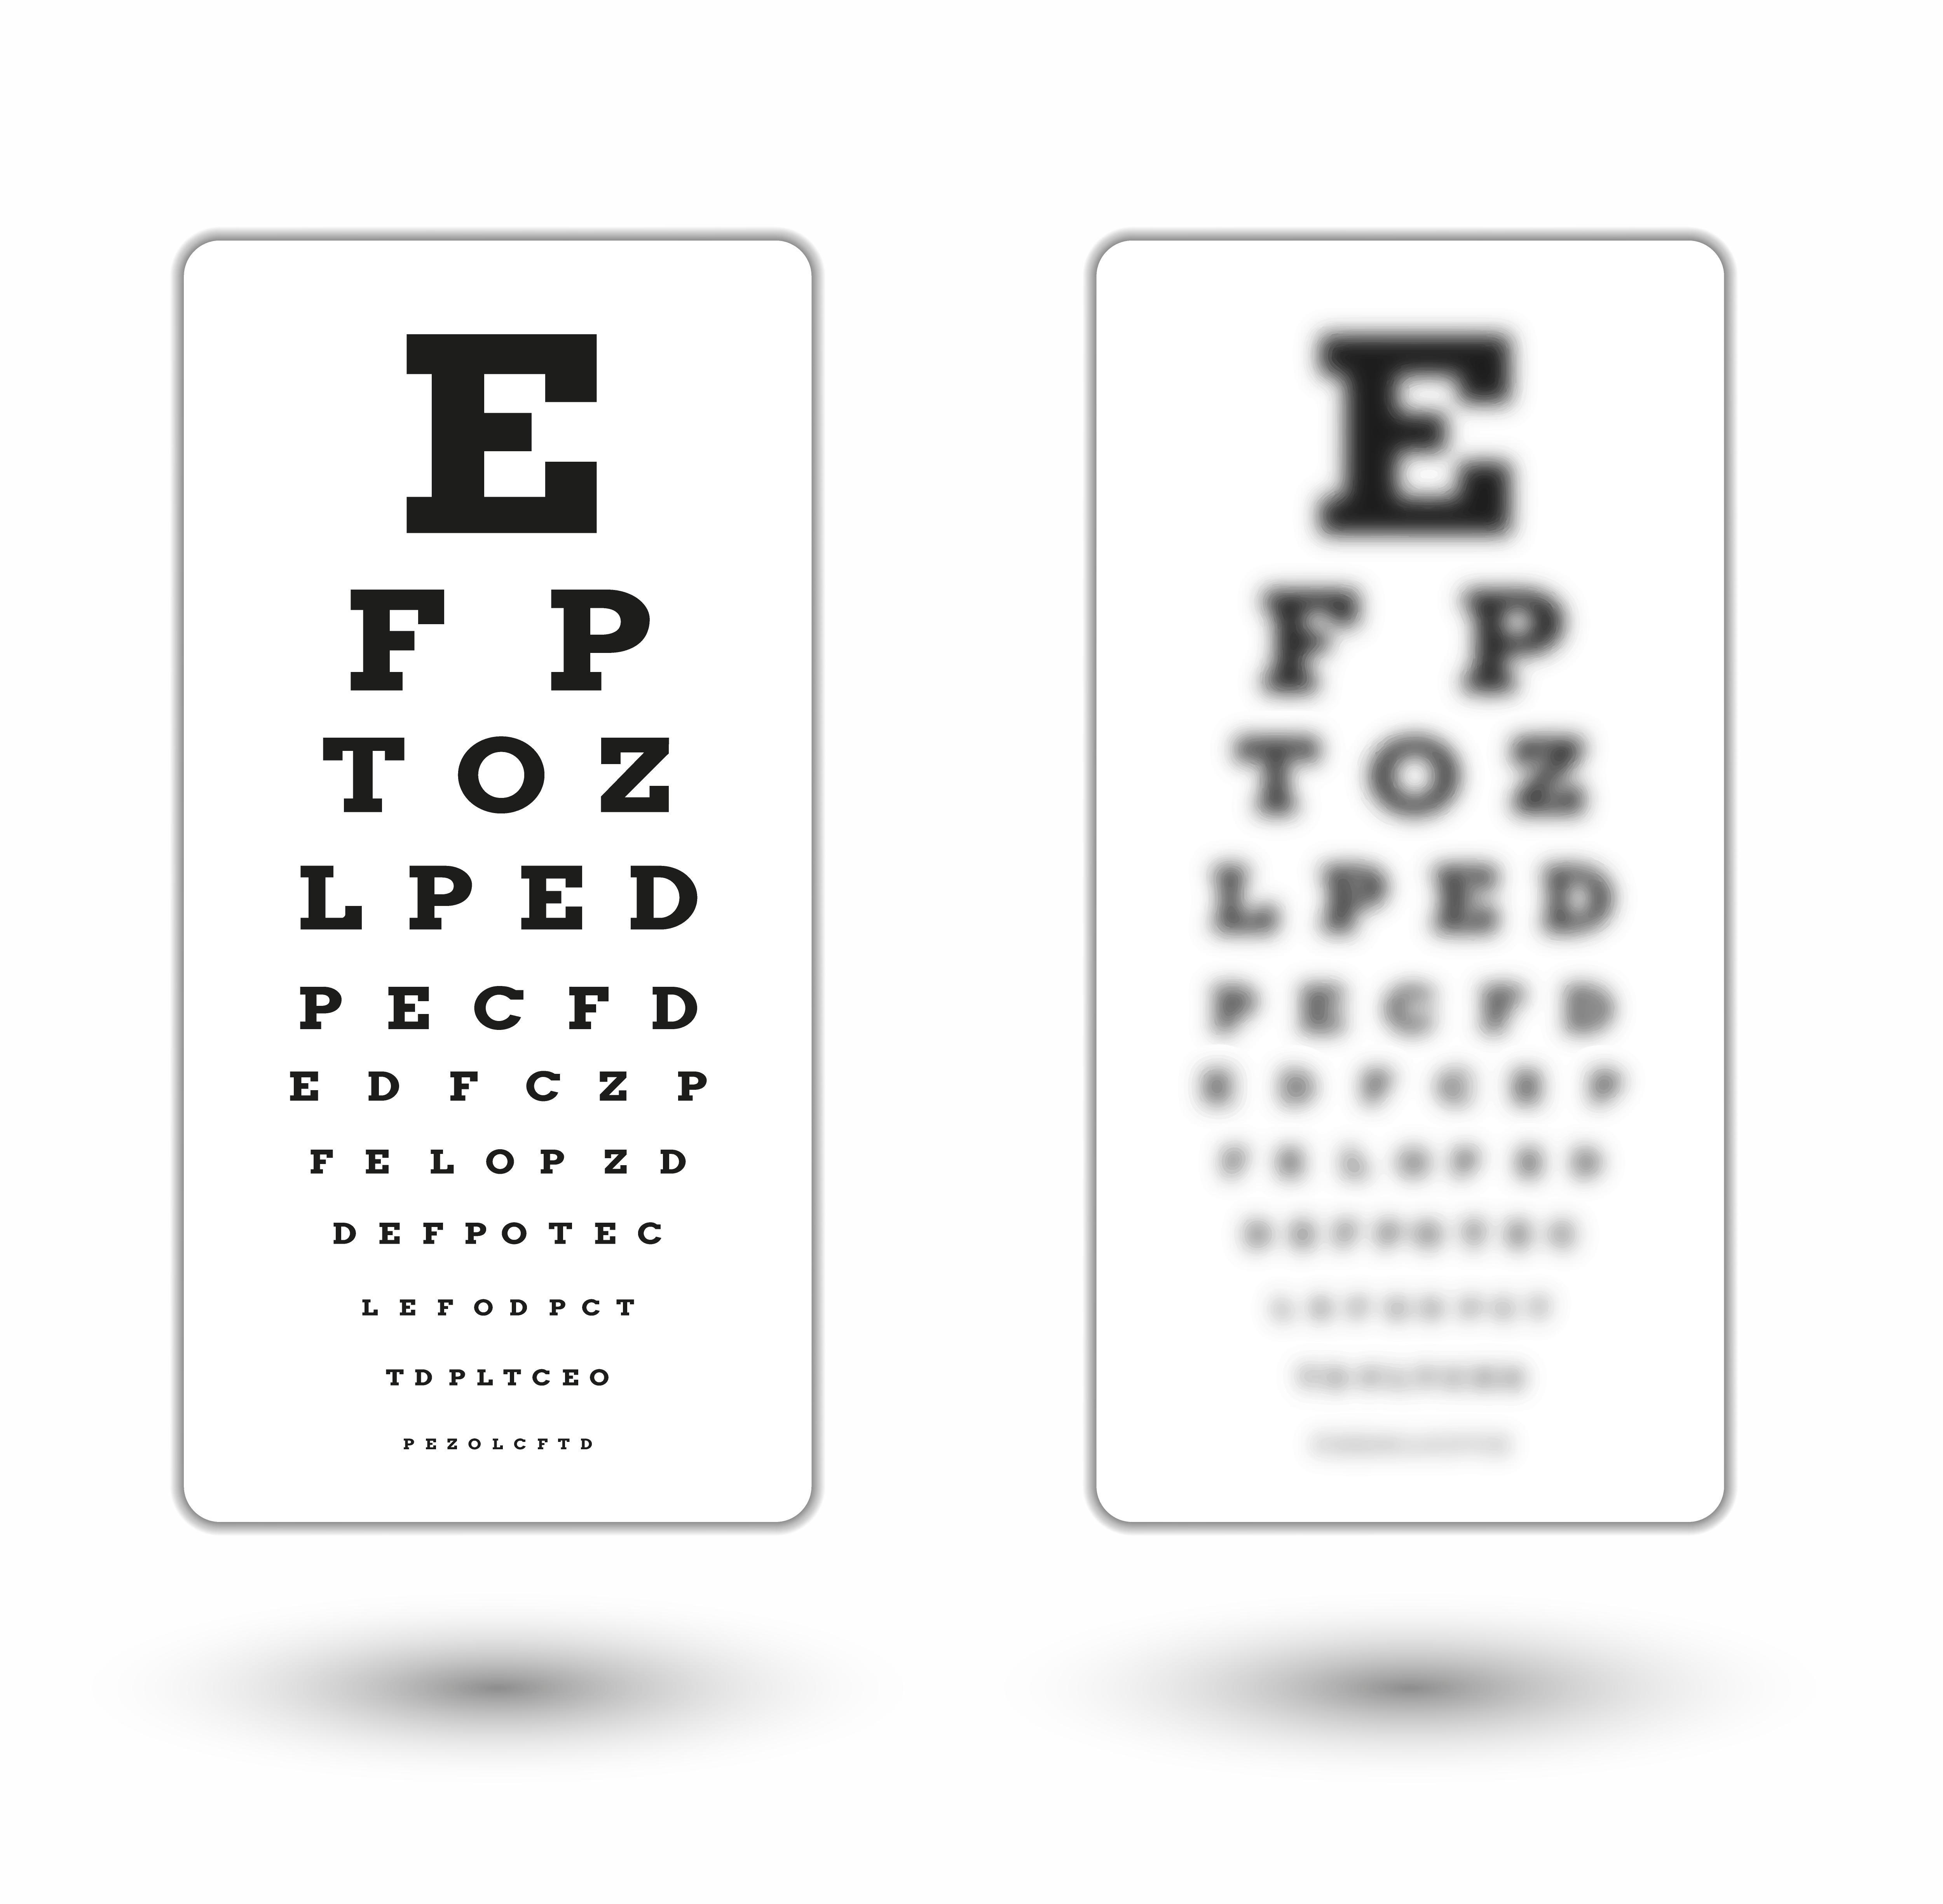 2b02e4887c Test de Snellen: un prueba clásica para calcular la agudeza visual ...